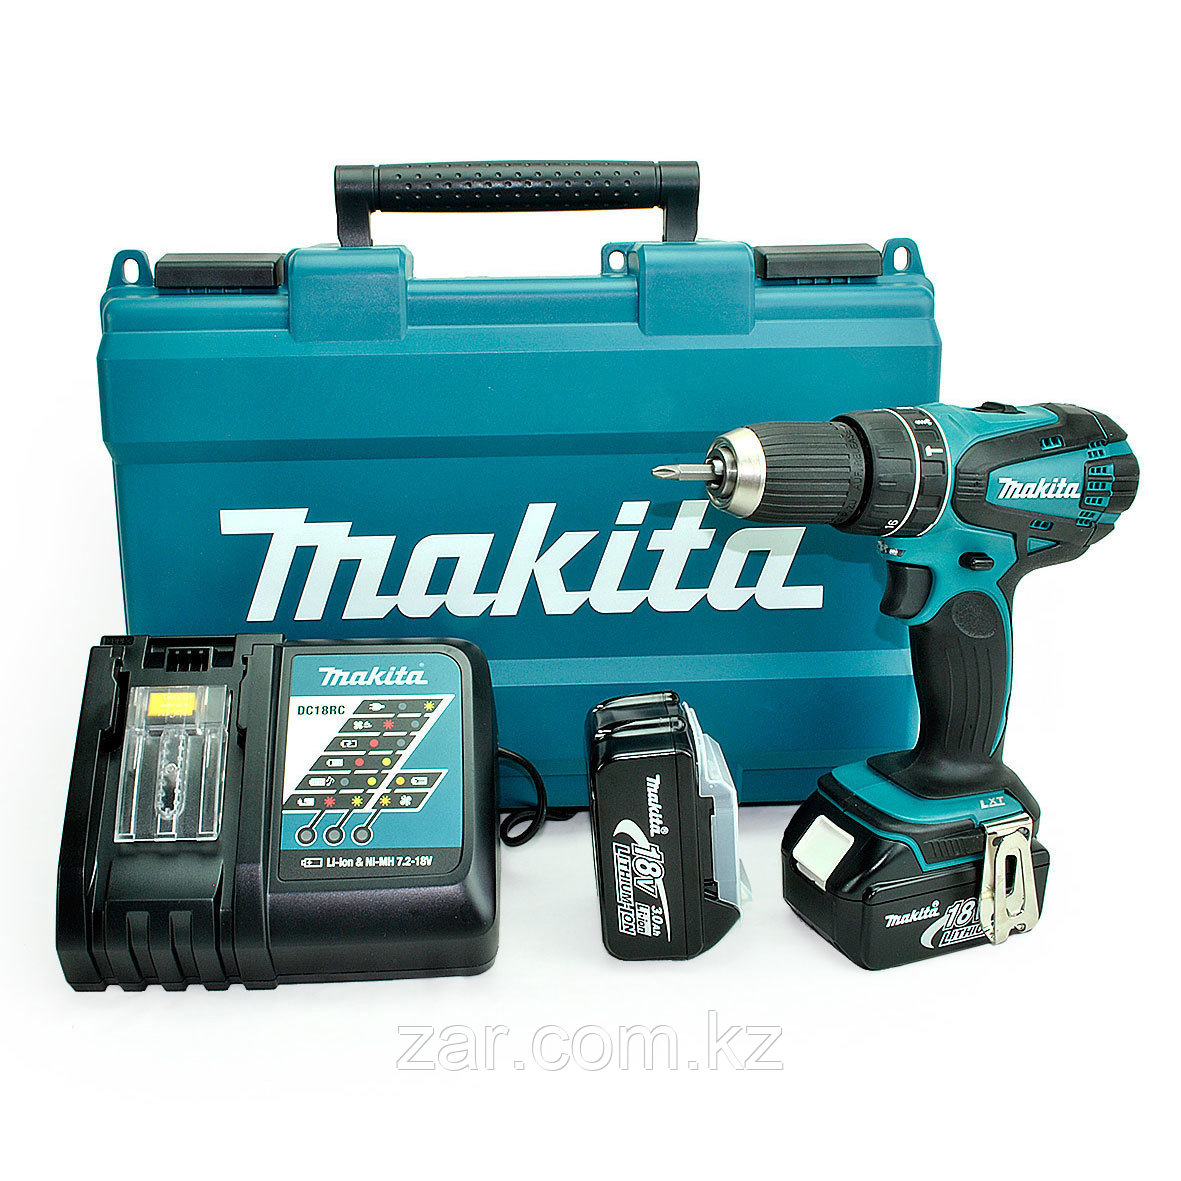 Аккумуляторная дрель-шуруповёрт Makita DDF456RFE